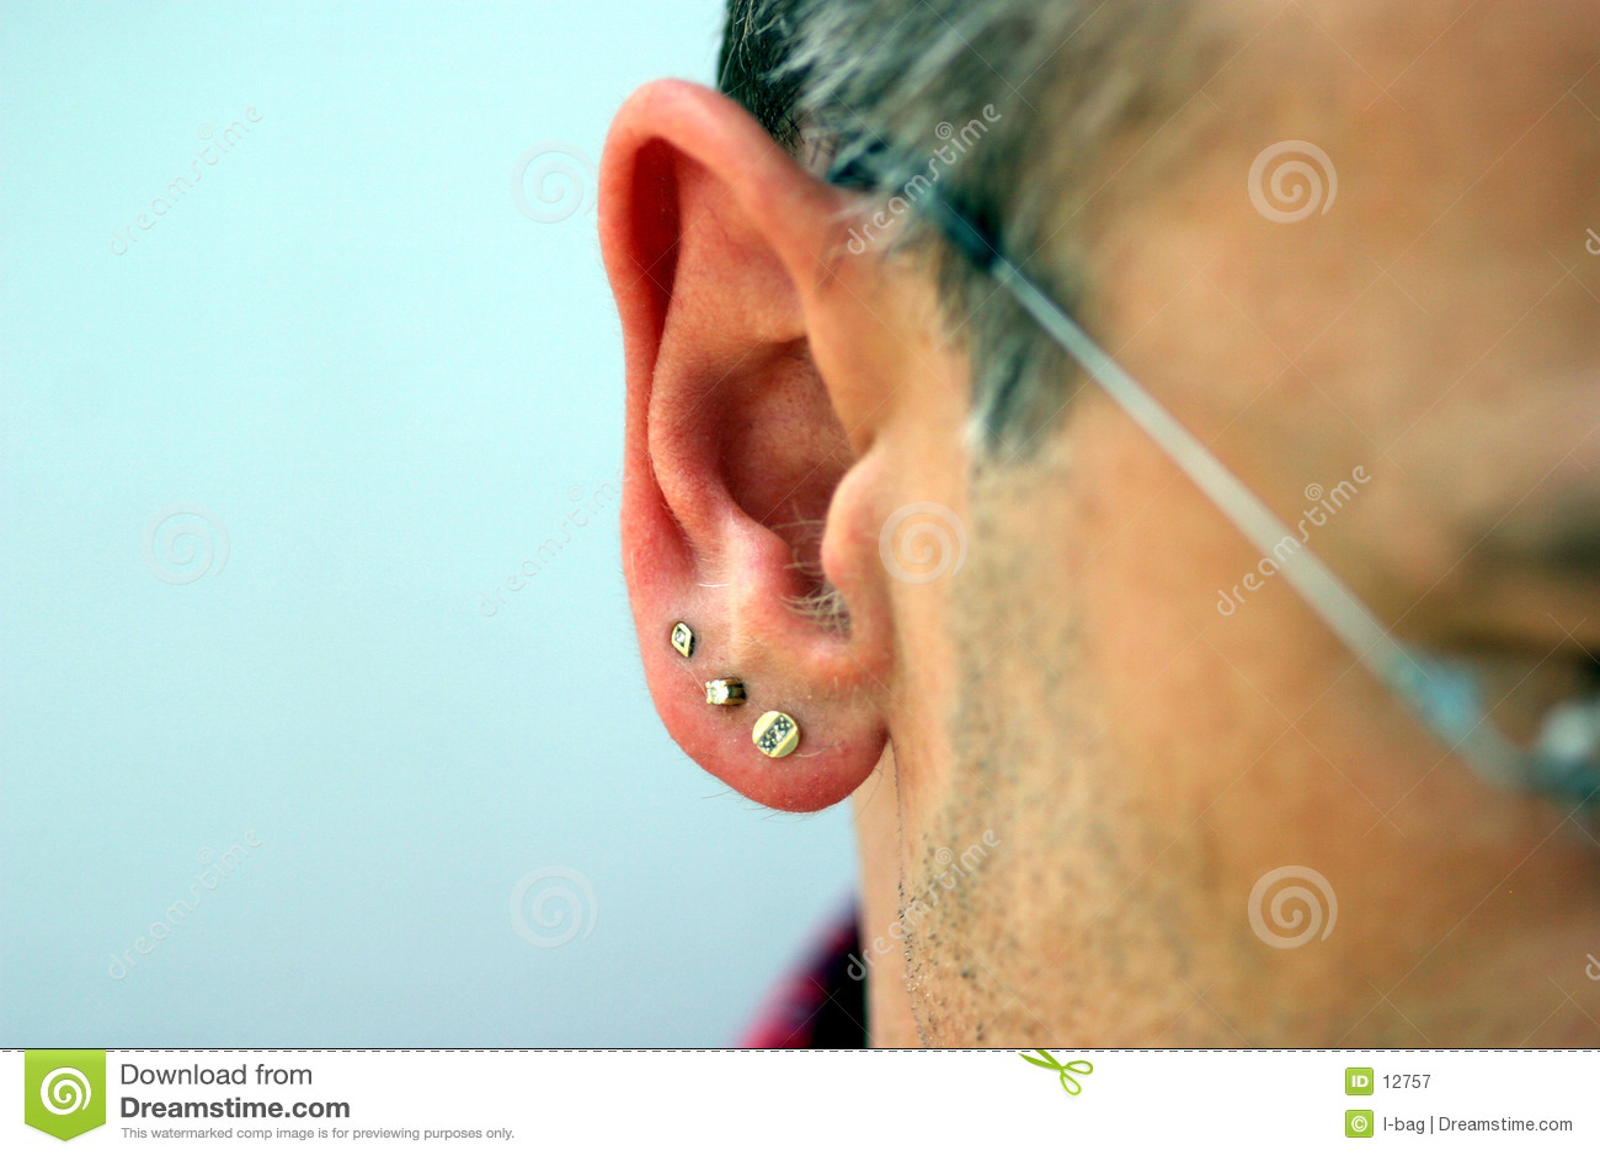 Joyería masculina del oído